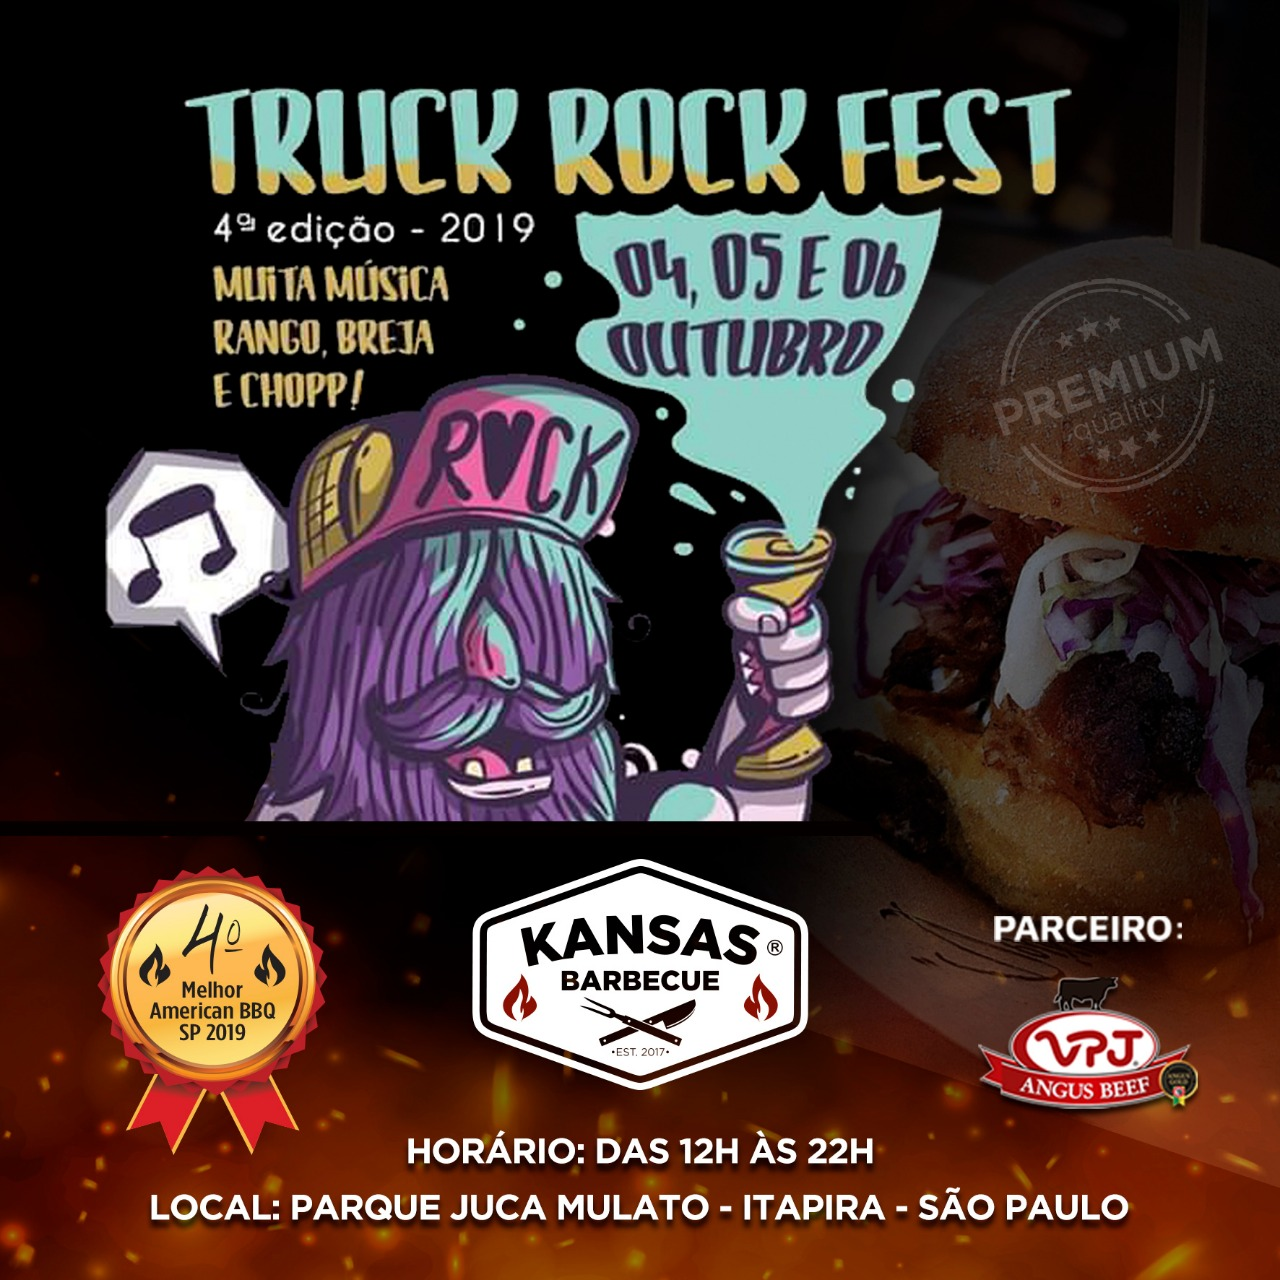 Truck Rock Fest em Itapira tem carnes VPJ